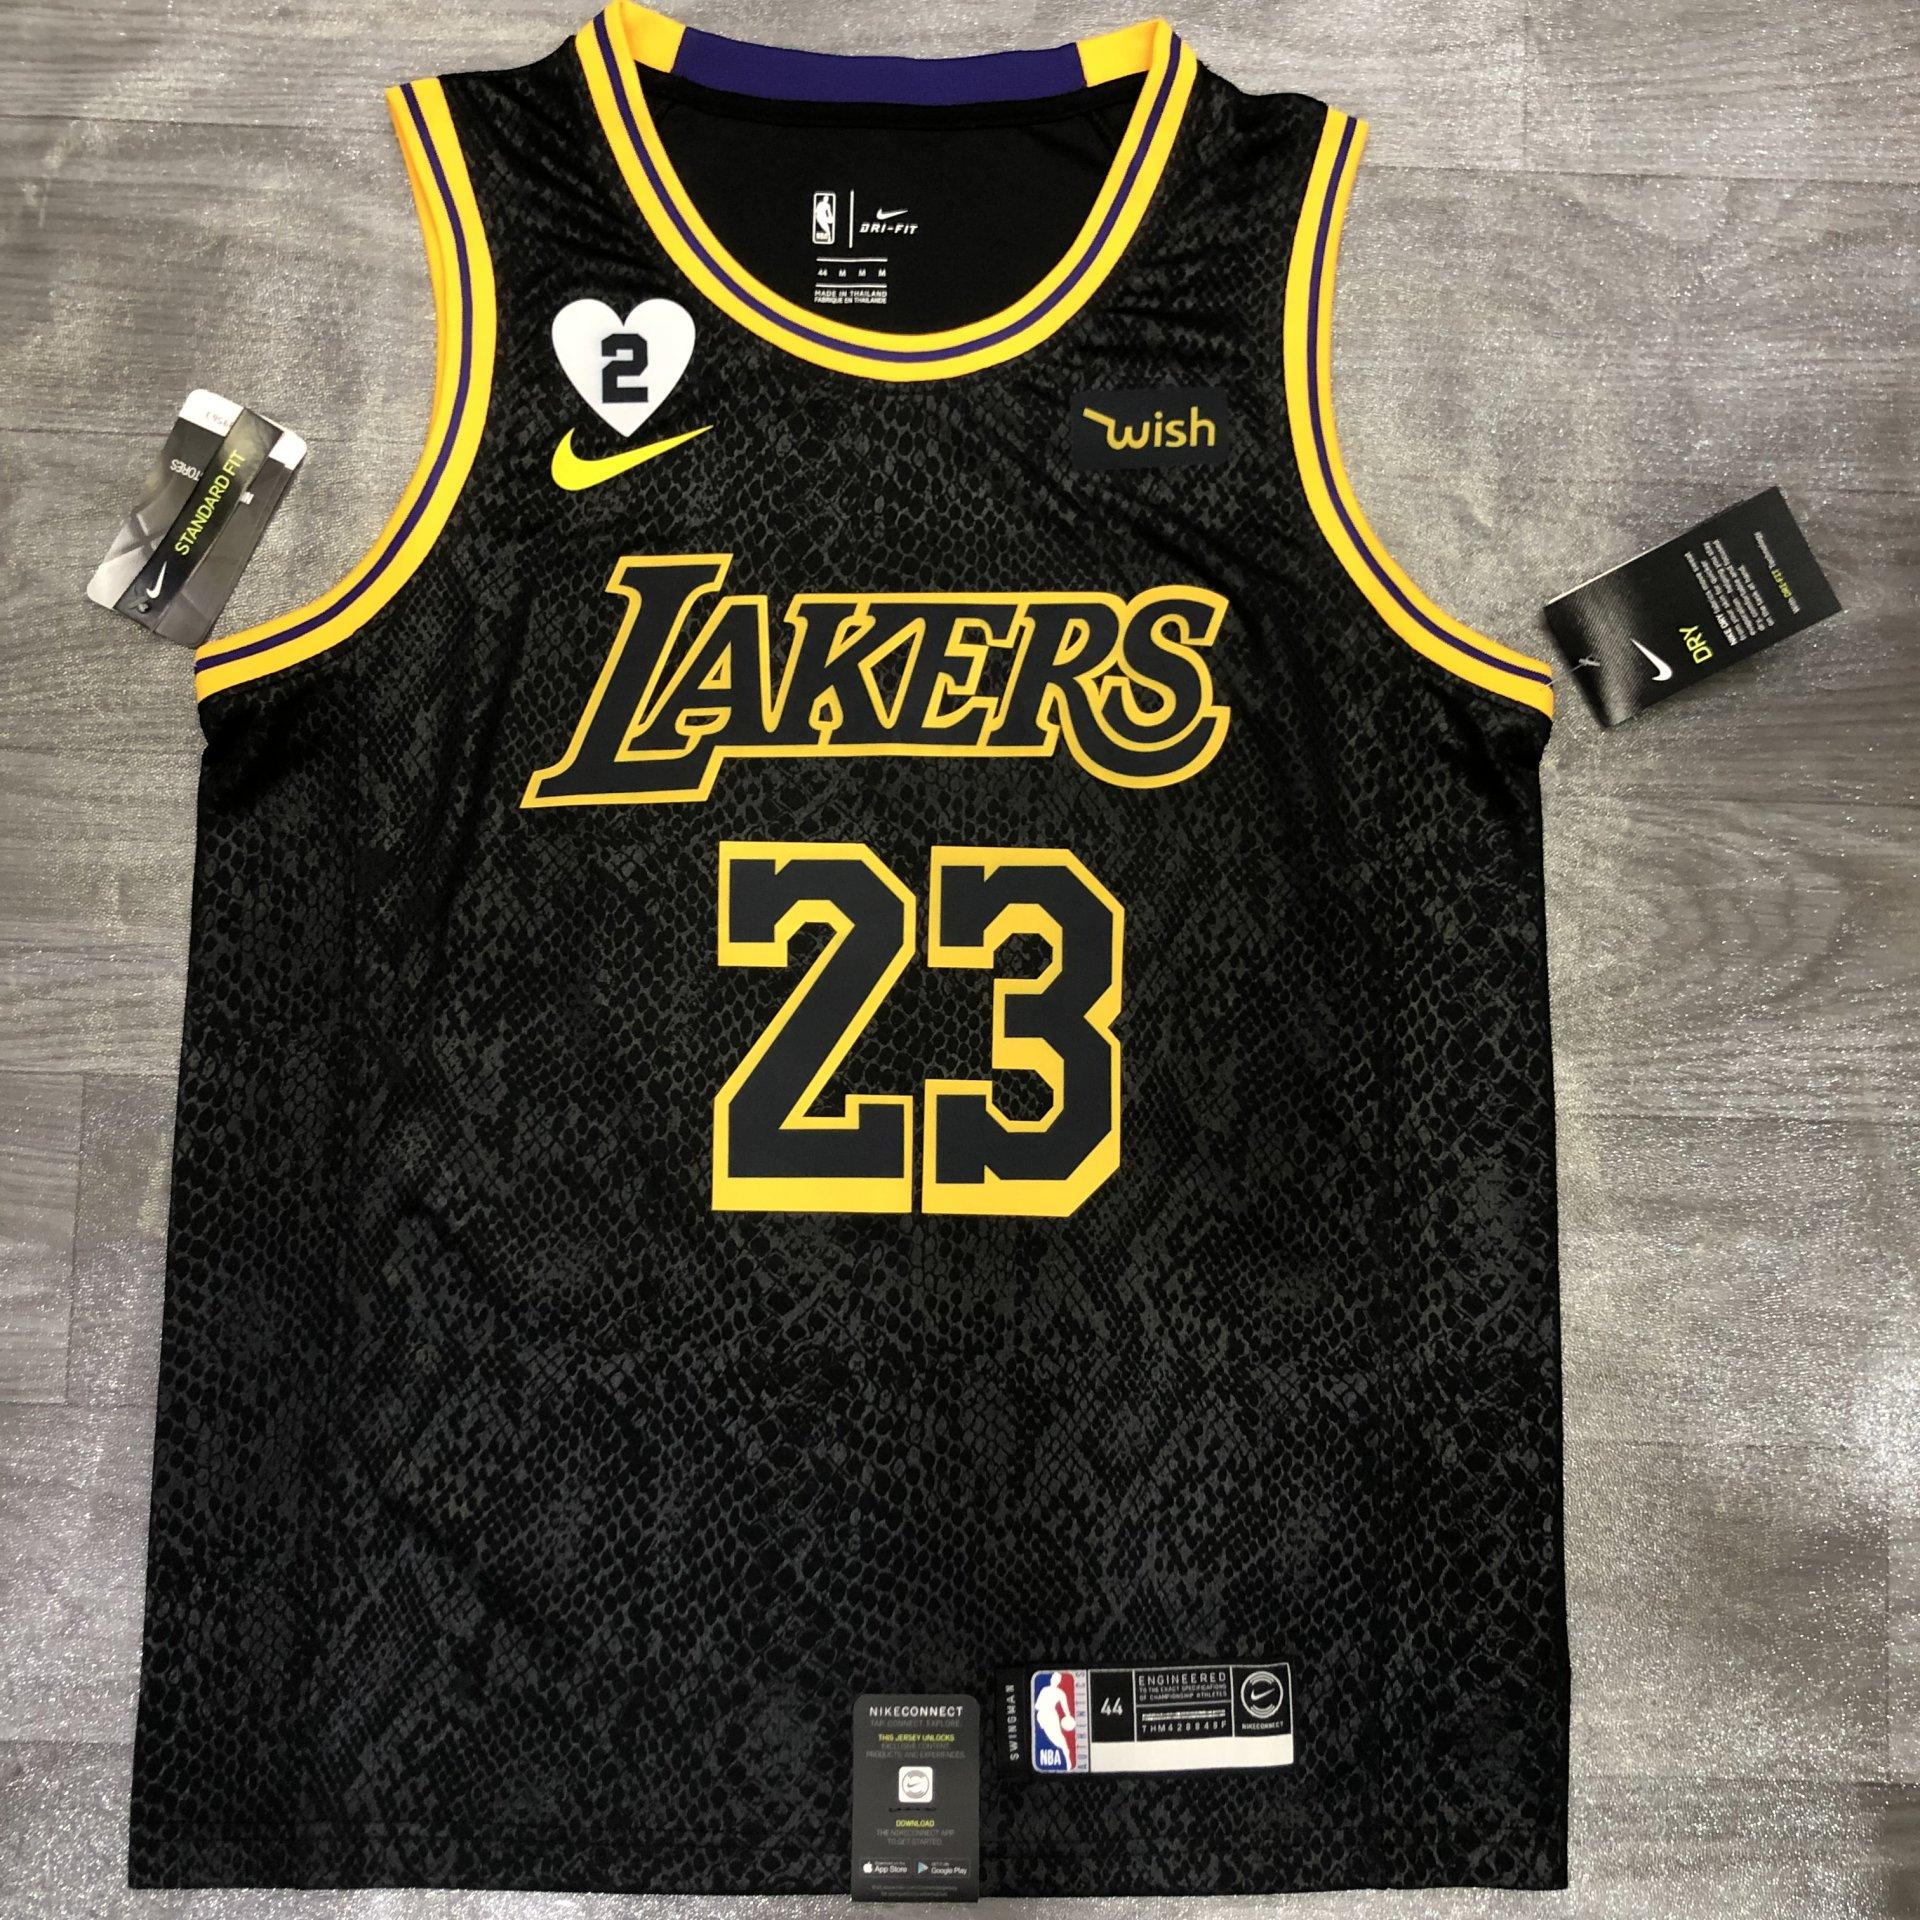 Lebron James - Los Angeles Lakers #23 *Black Mamba* WISH ...